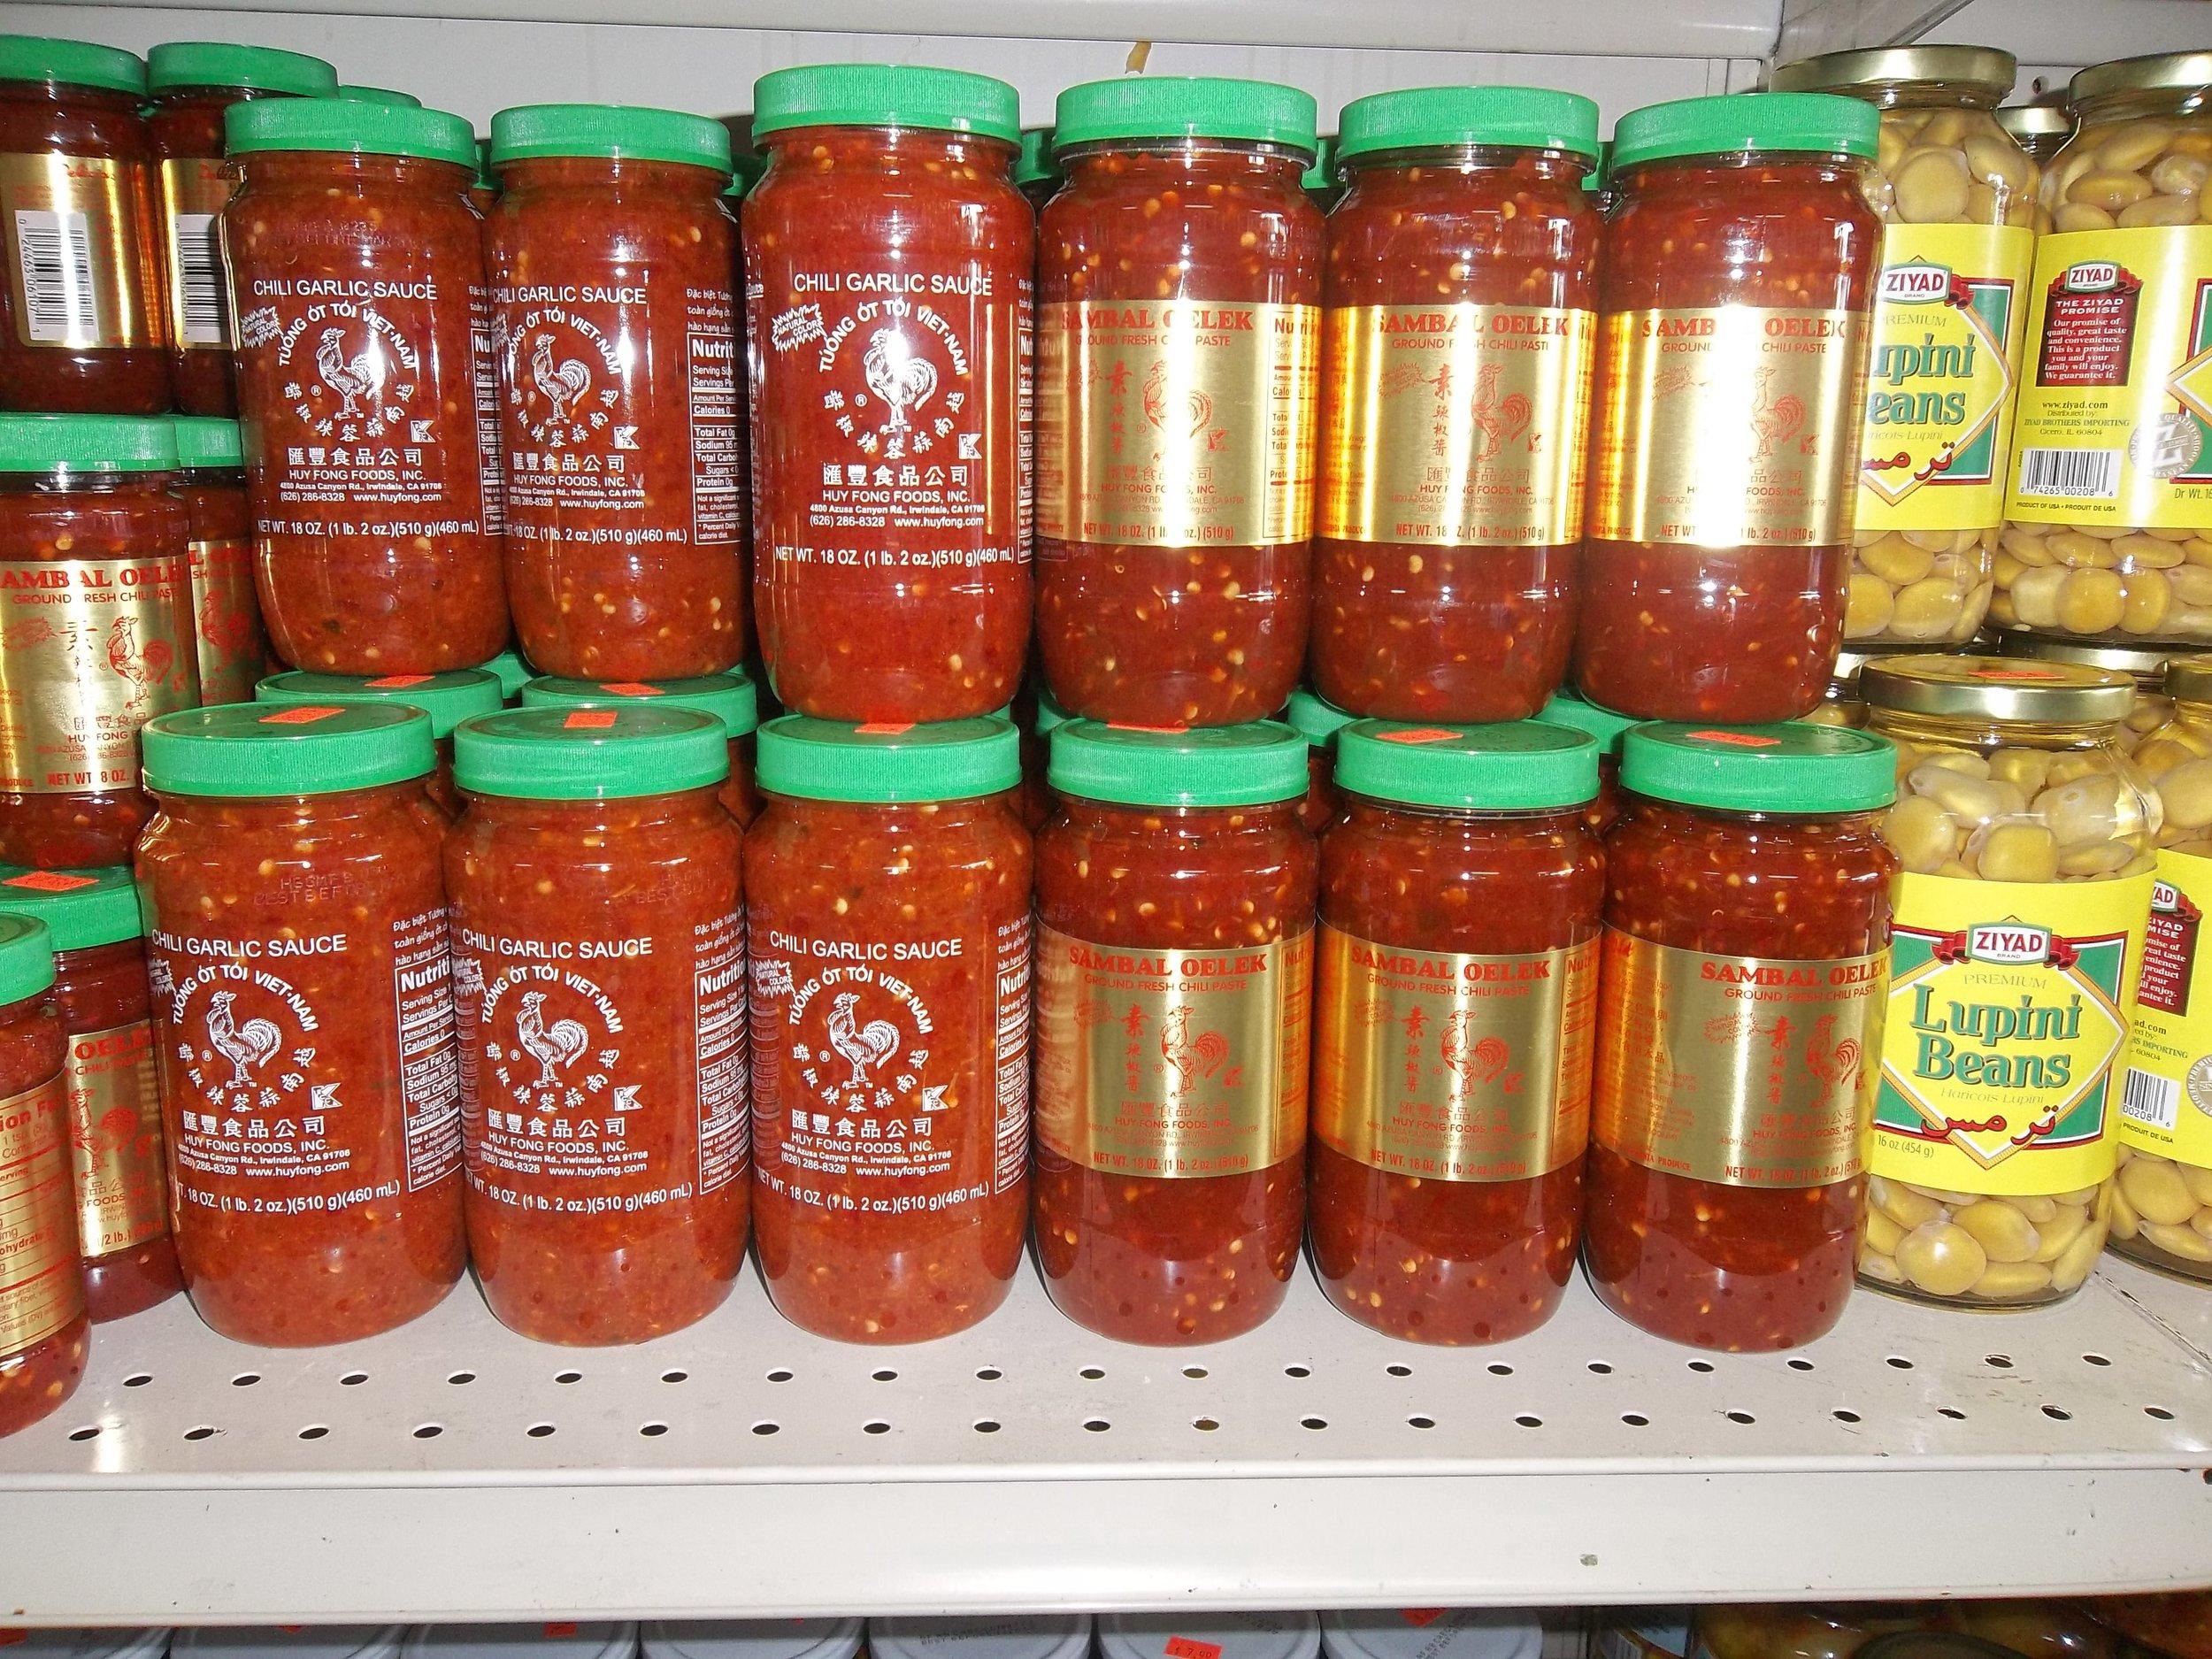 Chili-Garlic-Sauce-Pak-Halal-12259-W-87th-St-Parkway-Lenexa-KS-66215.JPG